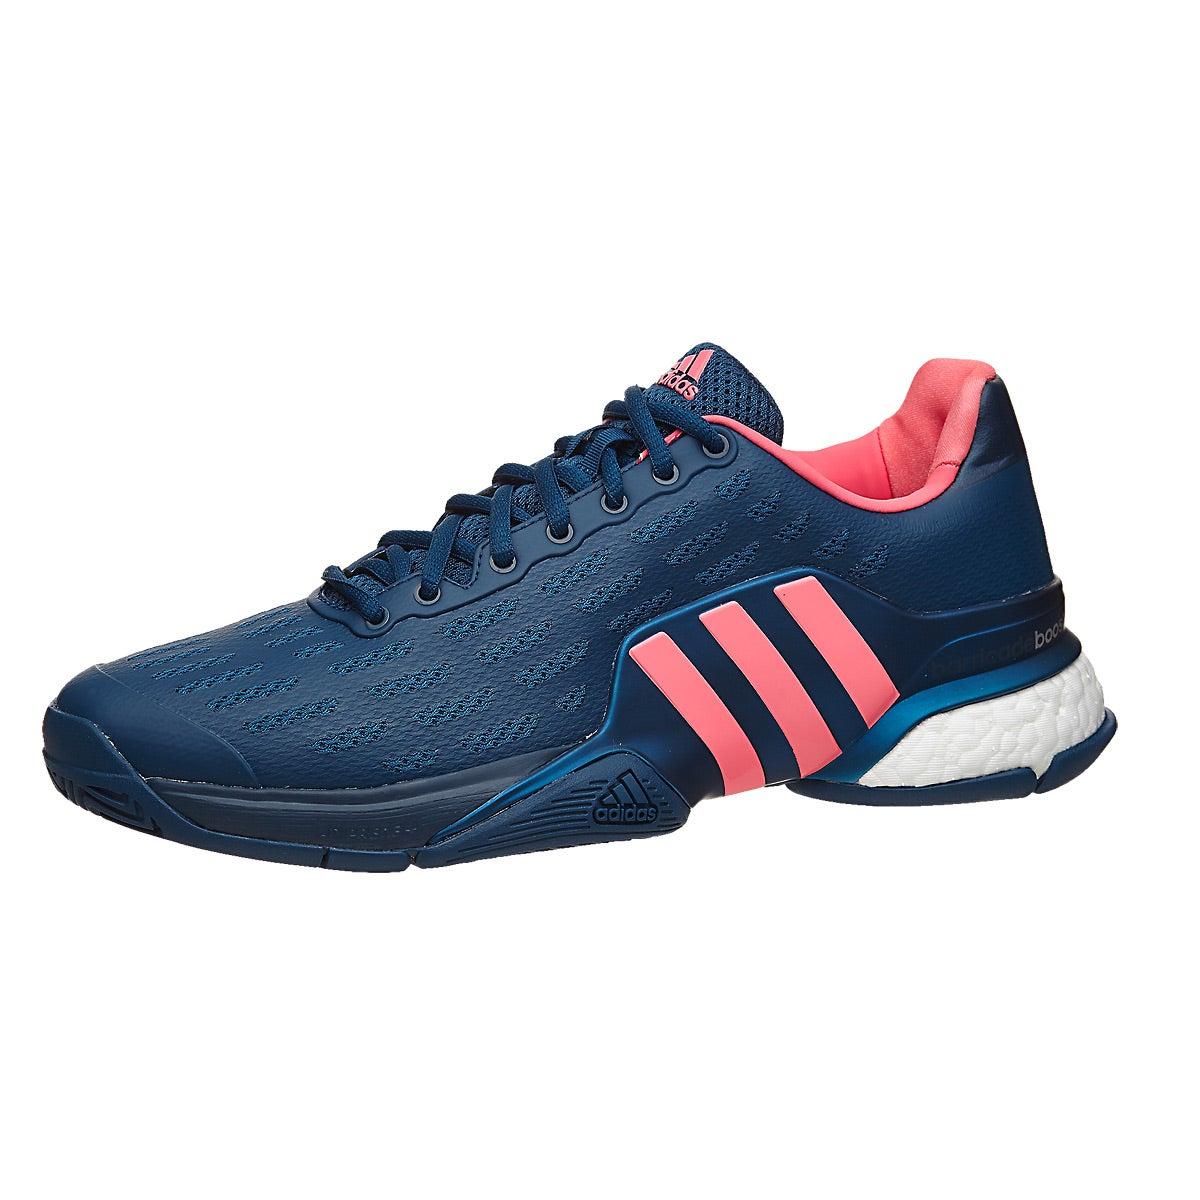 adidas barricata 2016 impulso marina / rosa delle scarpe maschili ° vista a 360